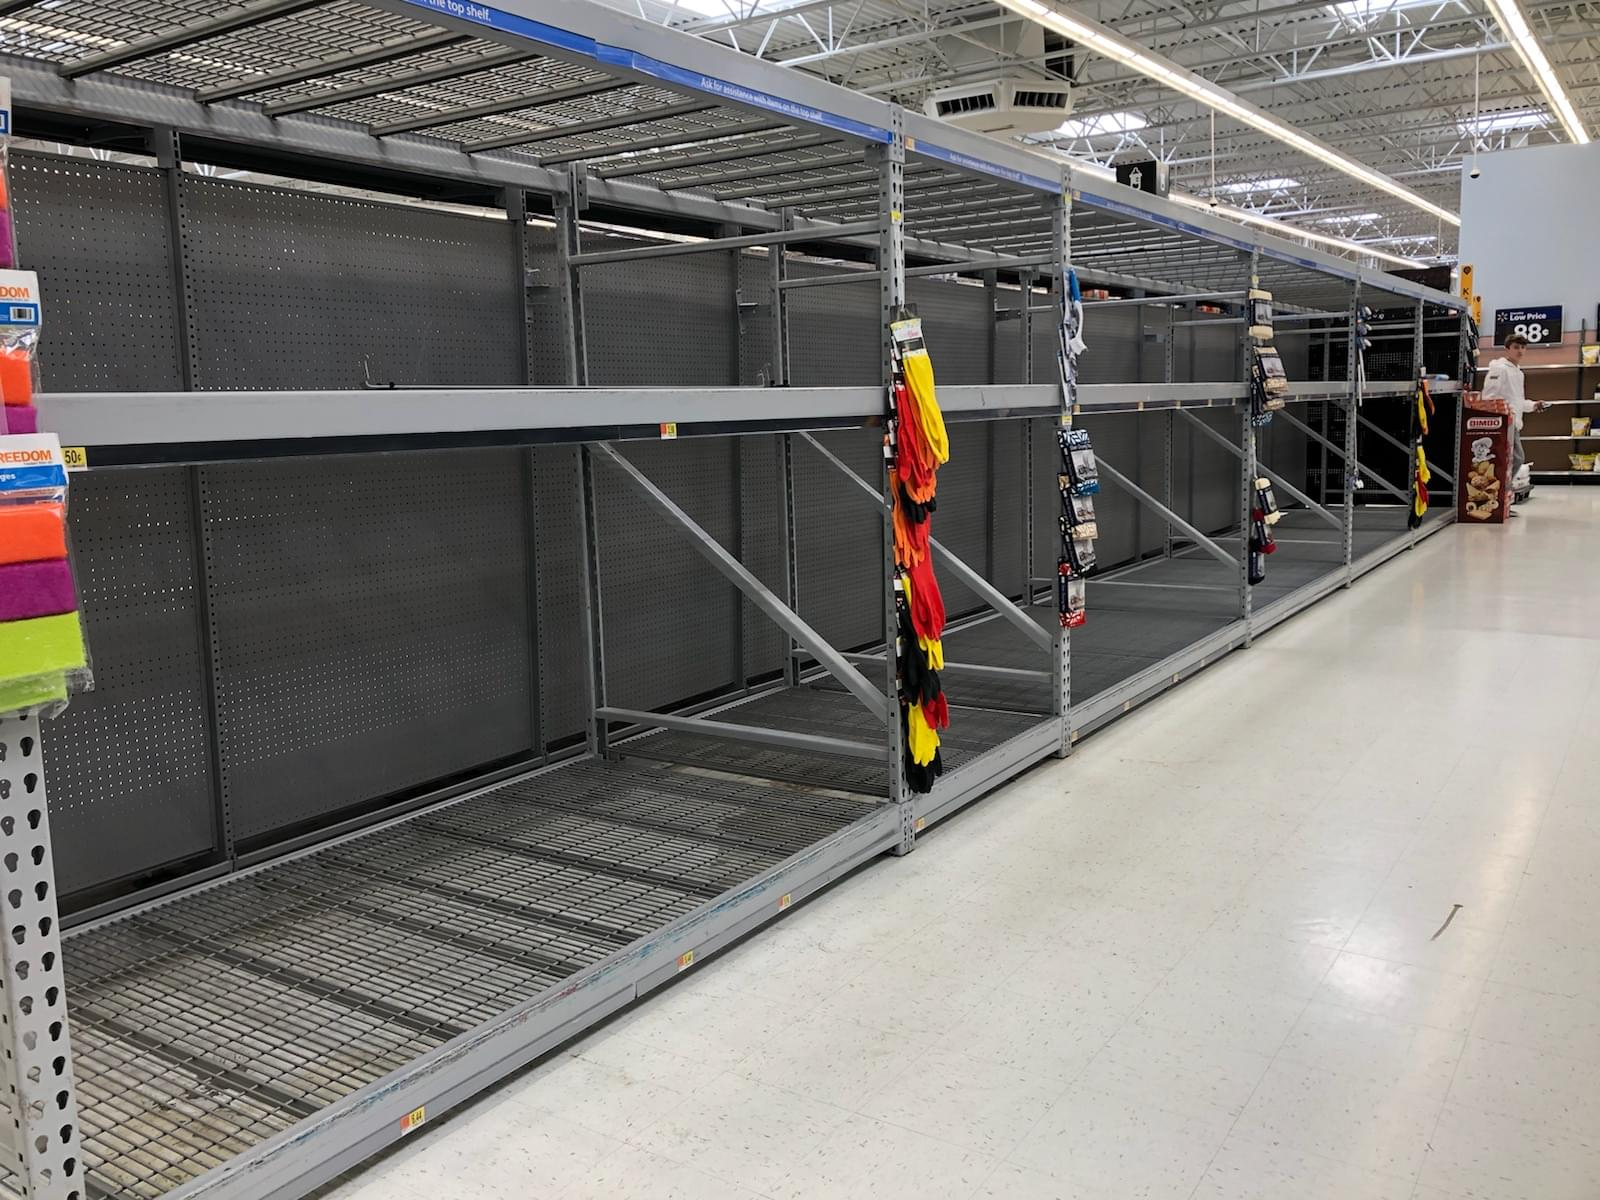 Illinois Retail Merchants Association applauding Illinois Attorney General's efforts to stop price gouging